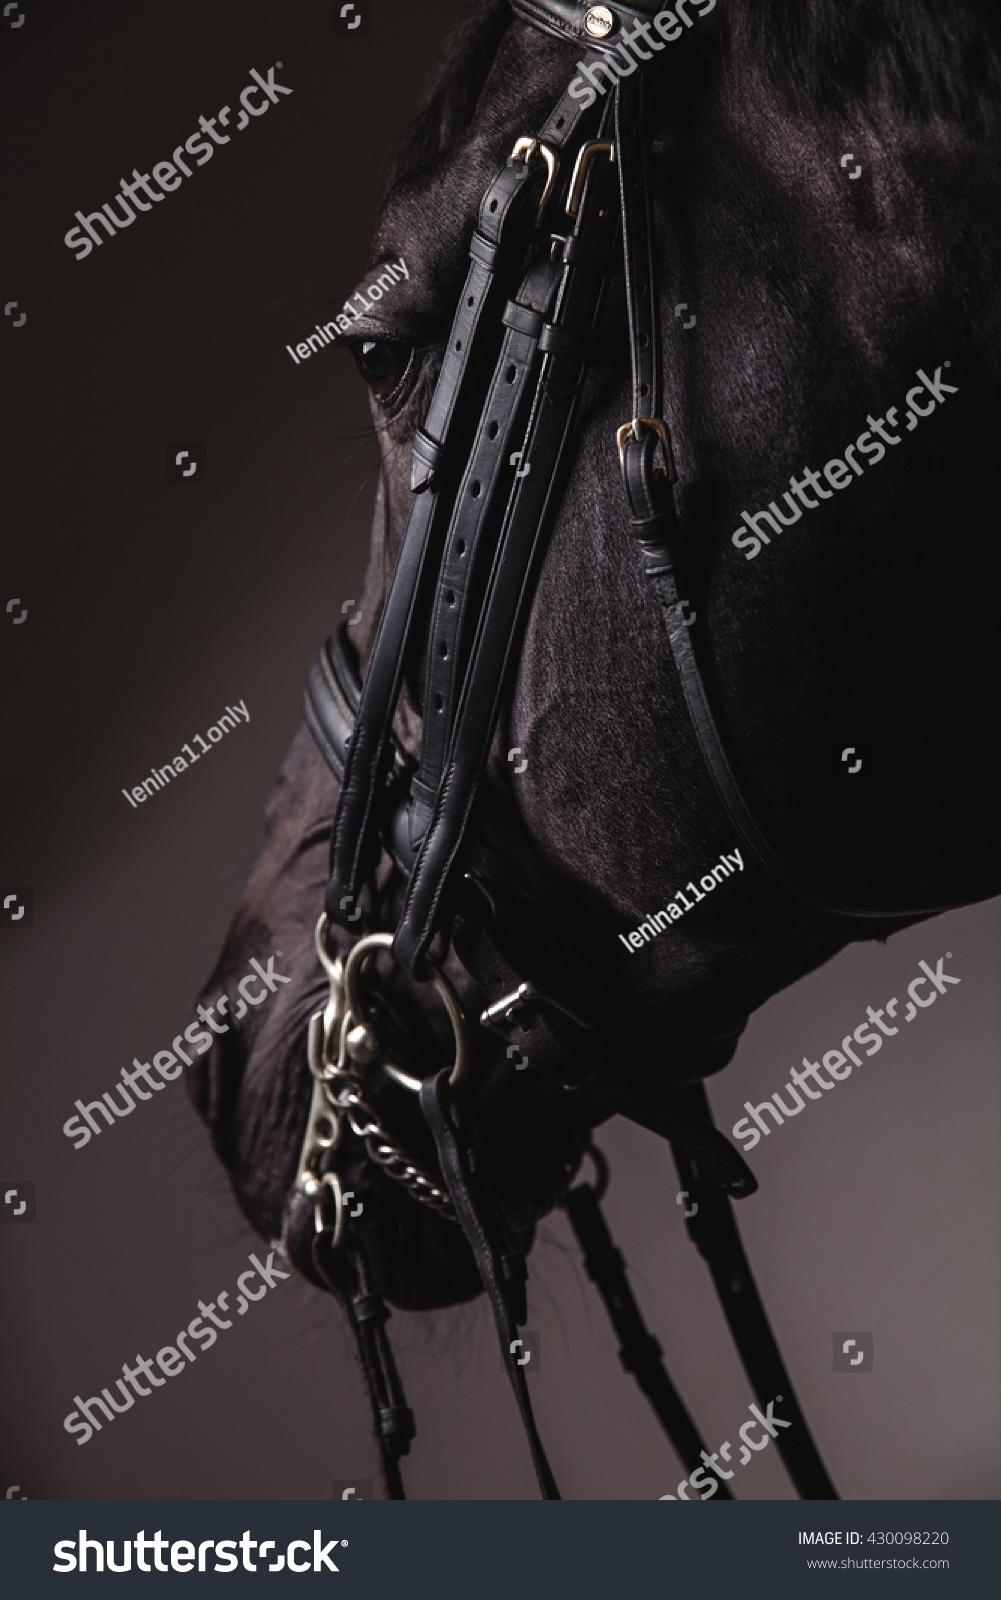 Black horse face close up - photo#44